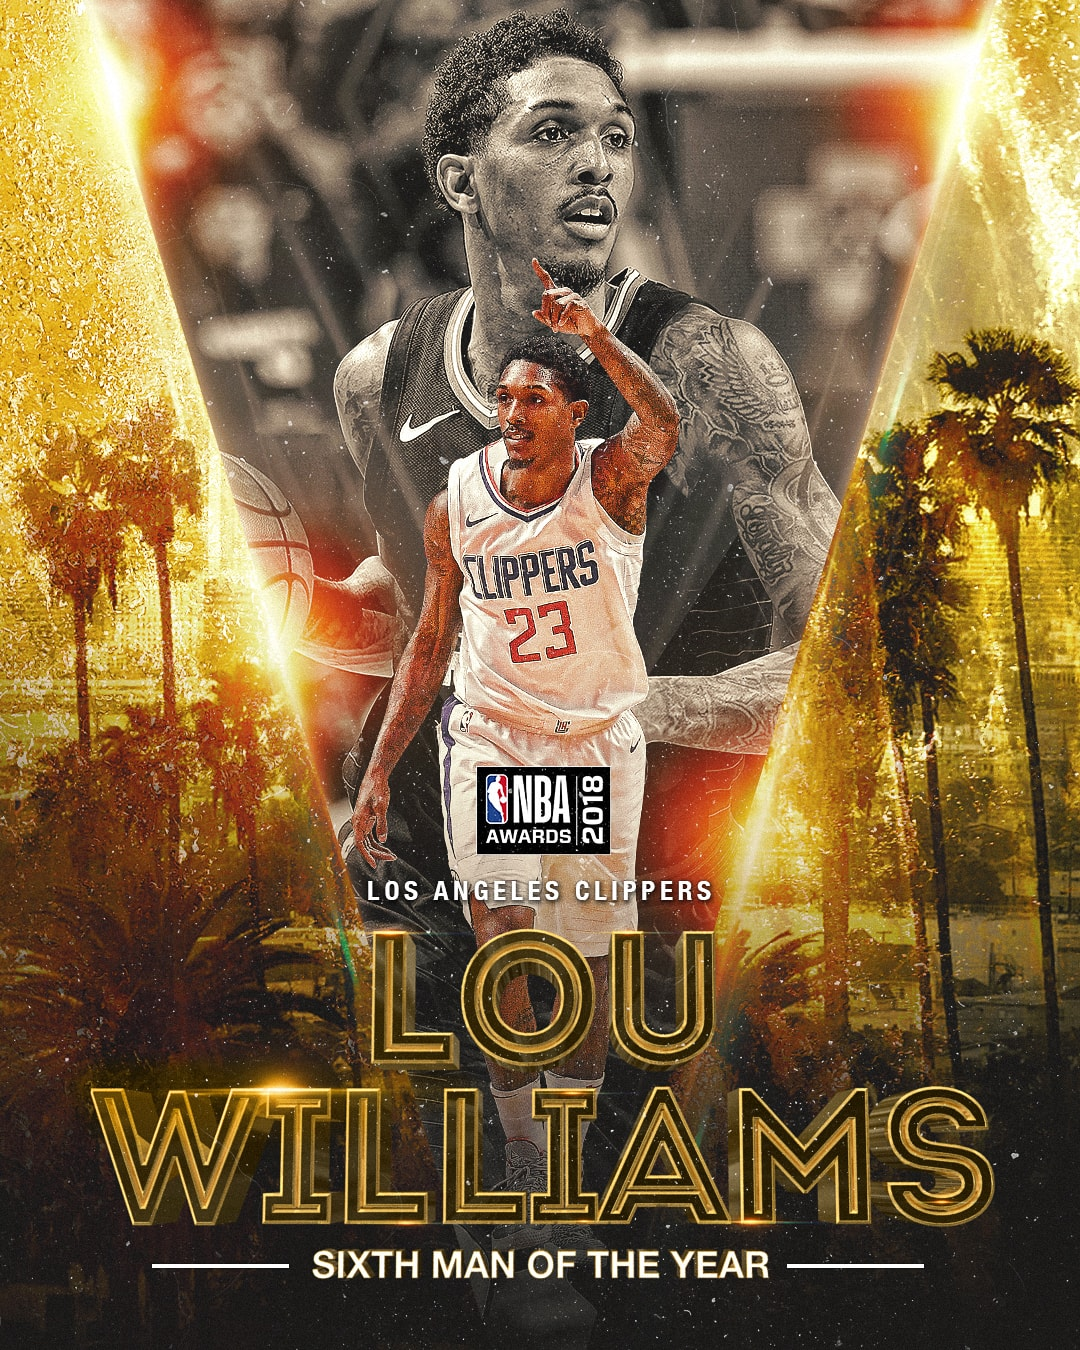 NBA Awards NBA Sixth Man of the Year Award- Lou Williams